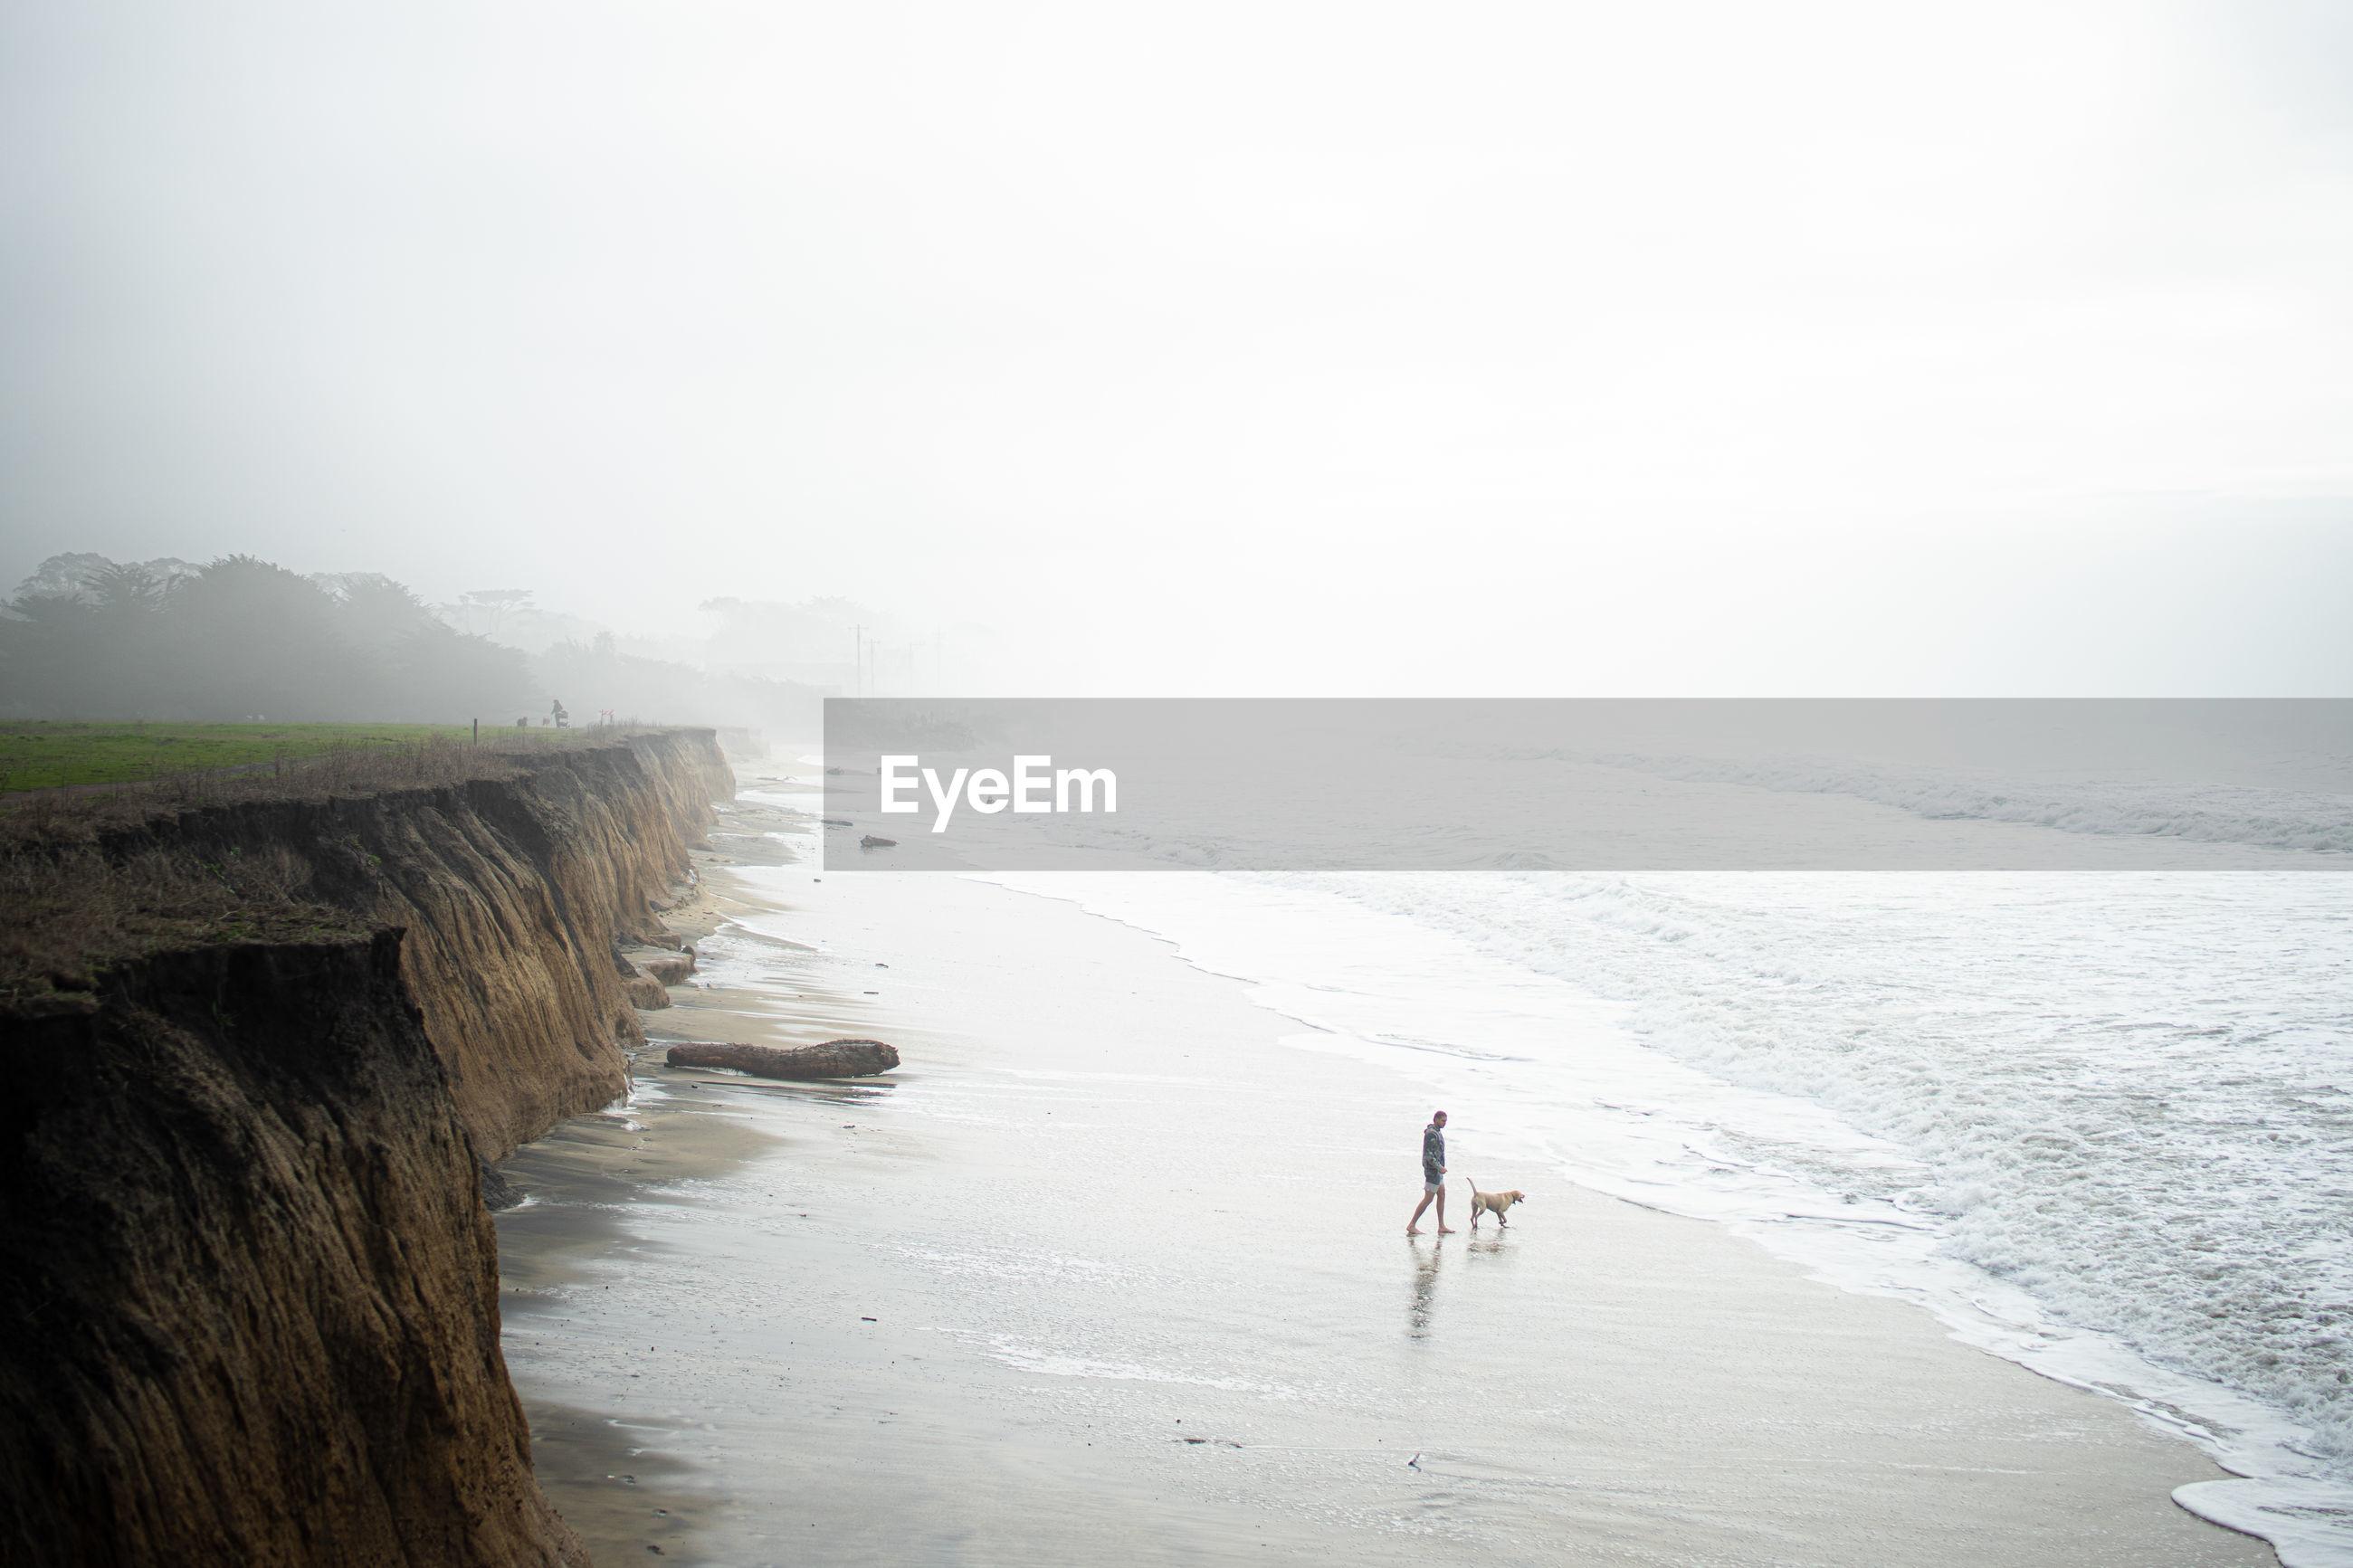 MEN WALKING ON BEACH AGAINST SKY